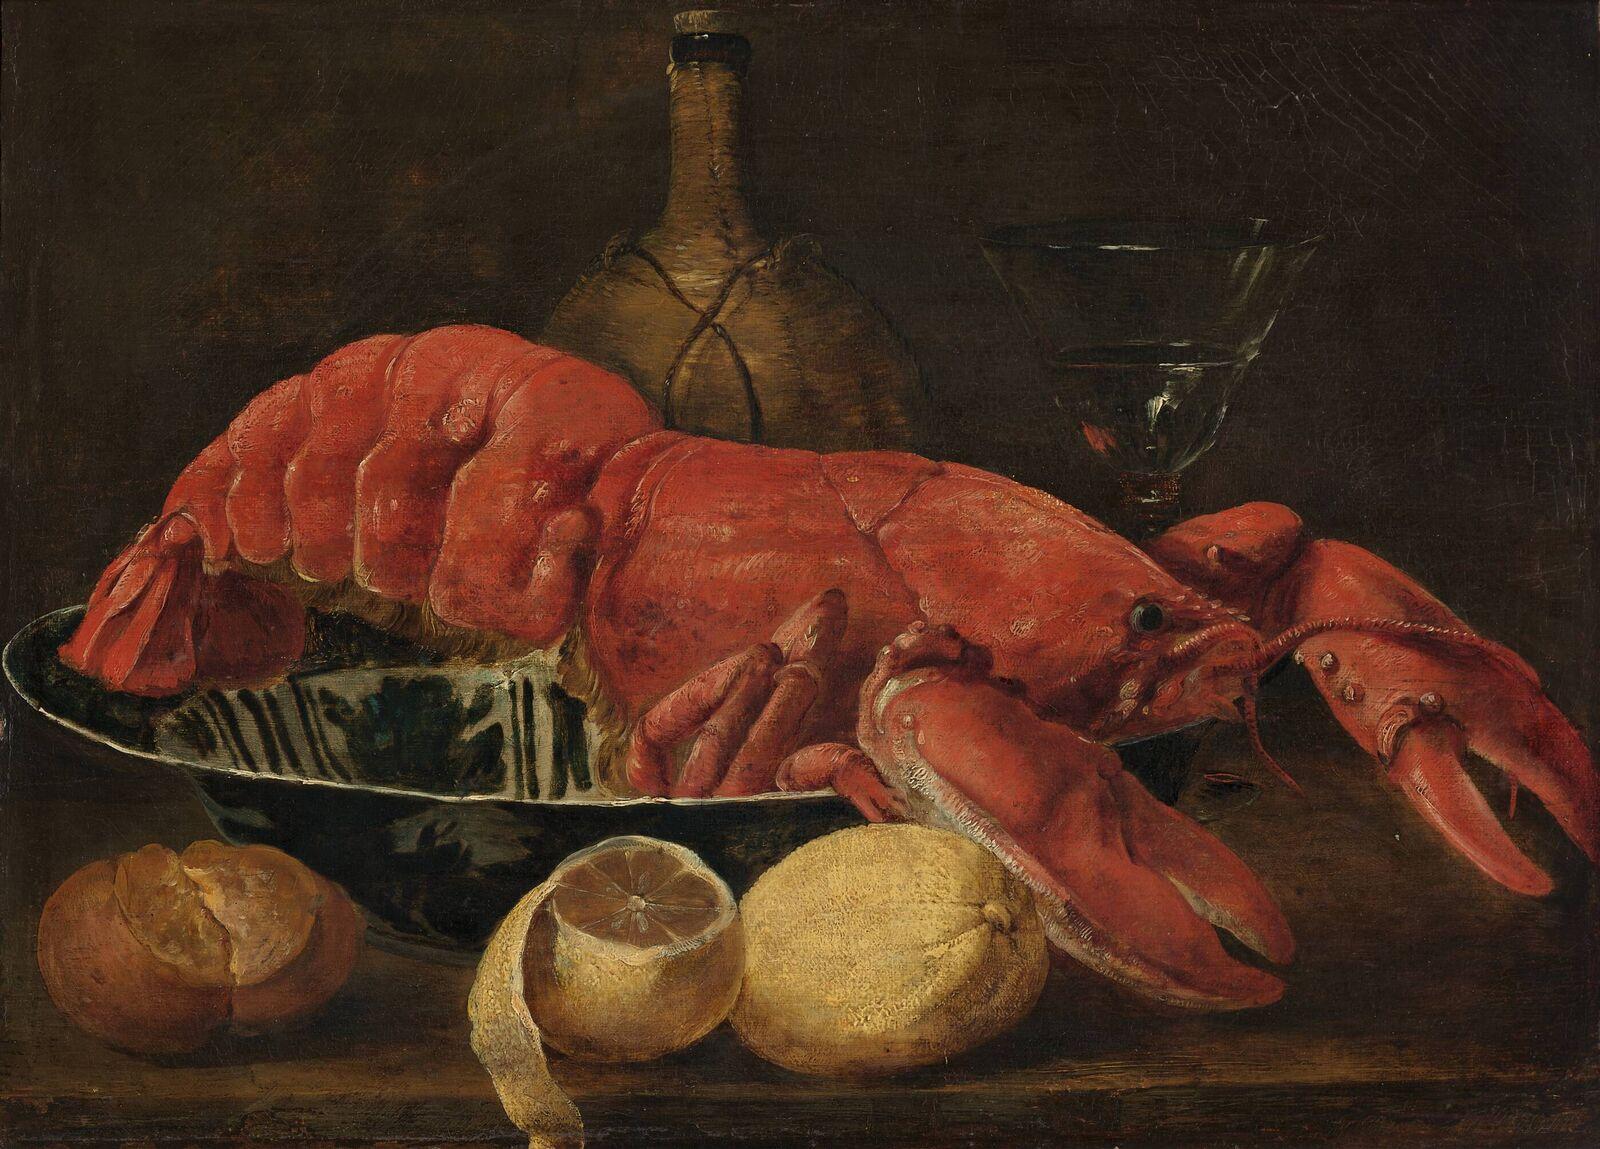 Joannes_Fijt_001A lobster in a porcelain dish.jpg